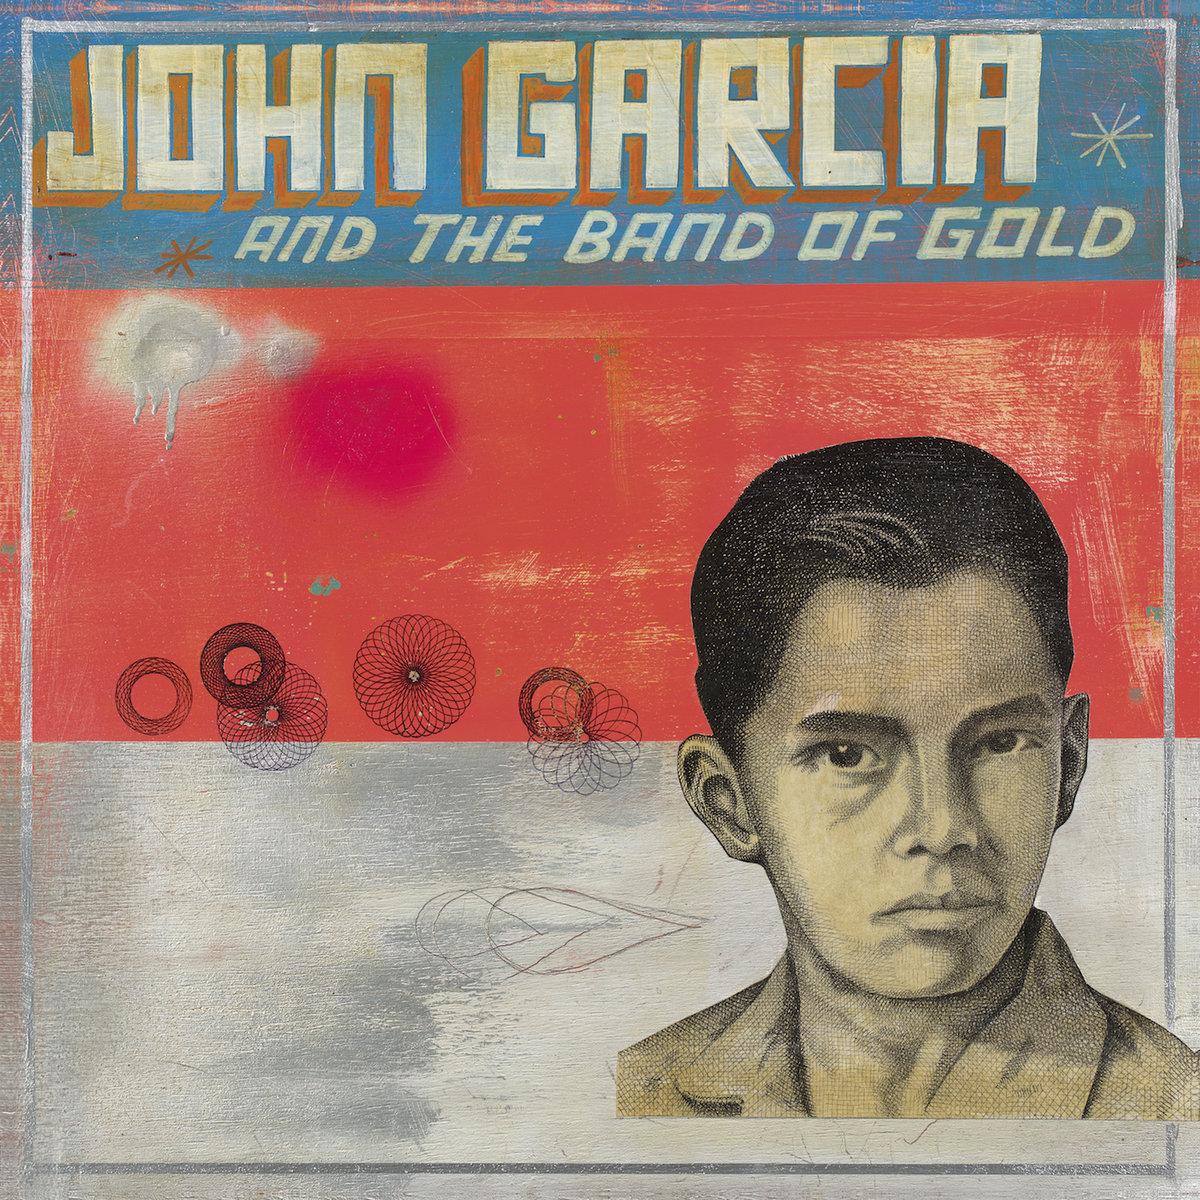 Mejores discos de 2019 - Página 2 John-Garcia-The-Band-Of-Gold